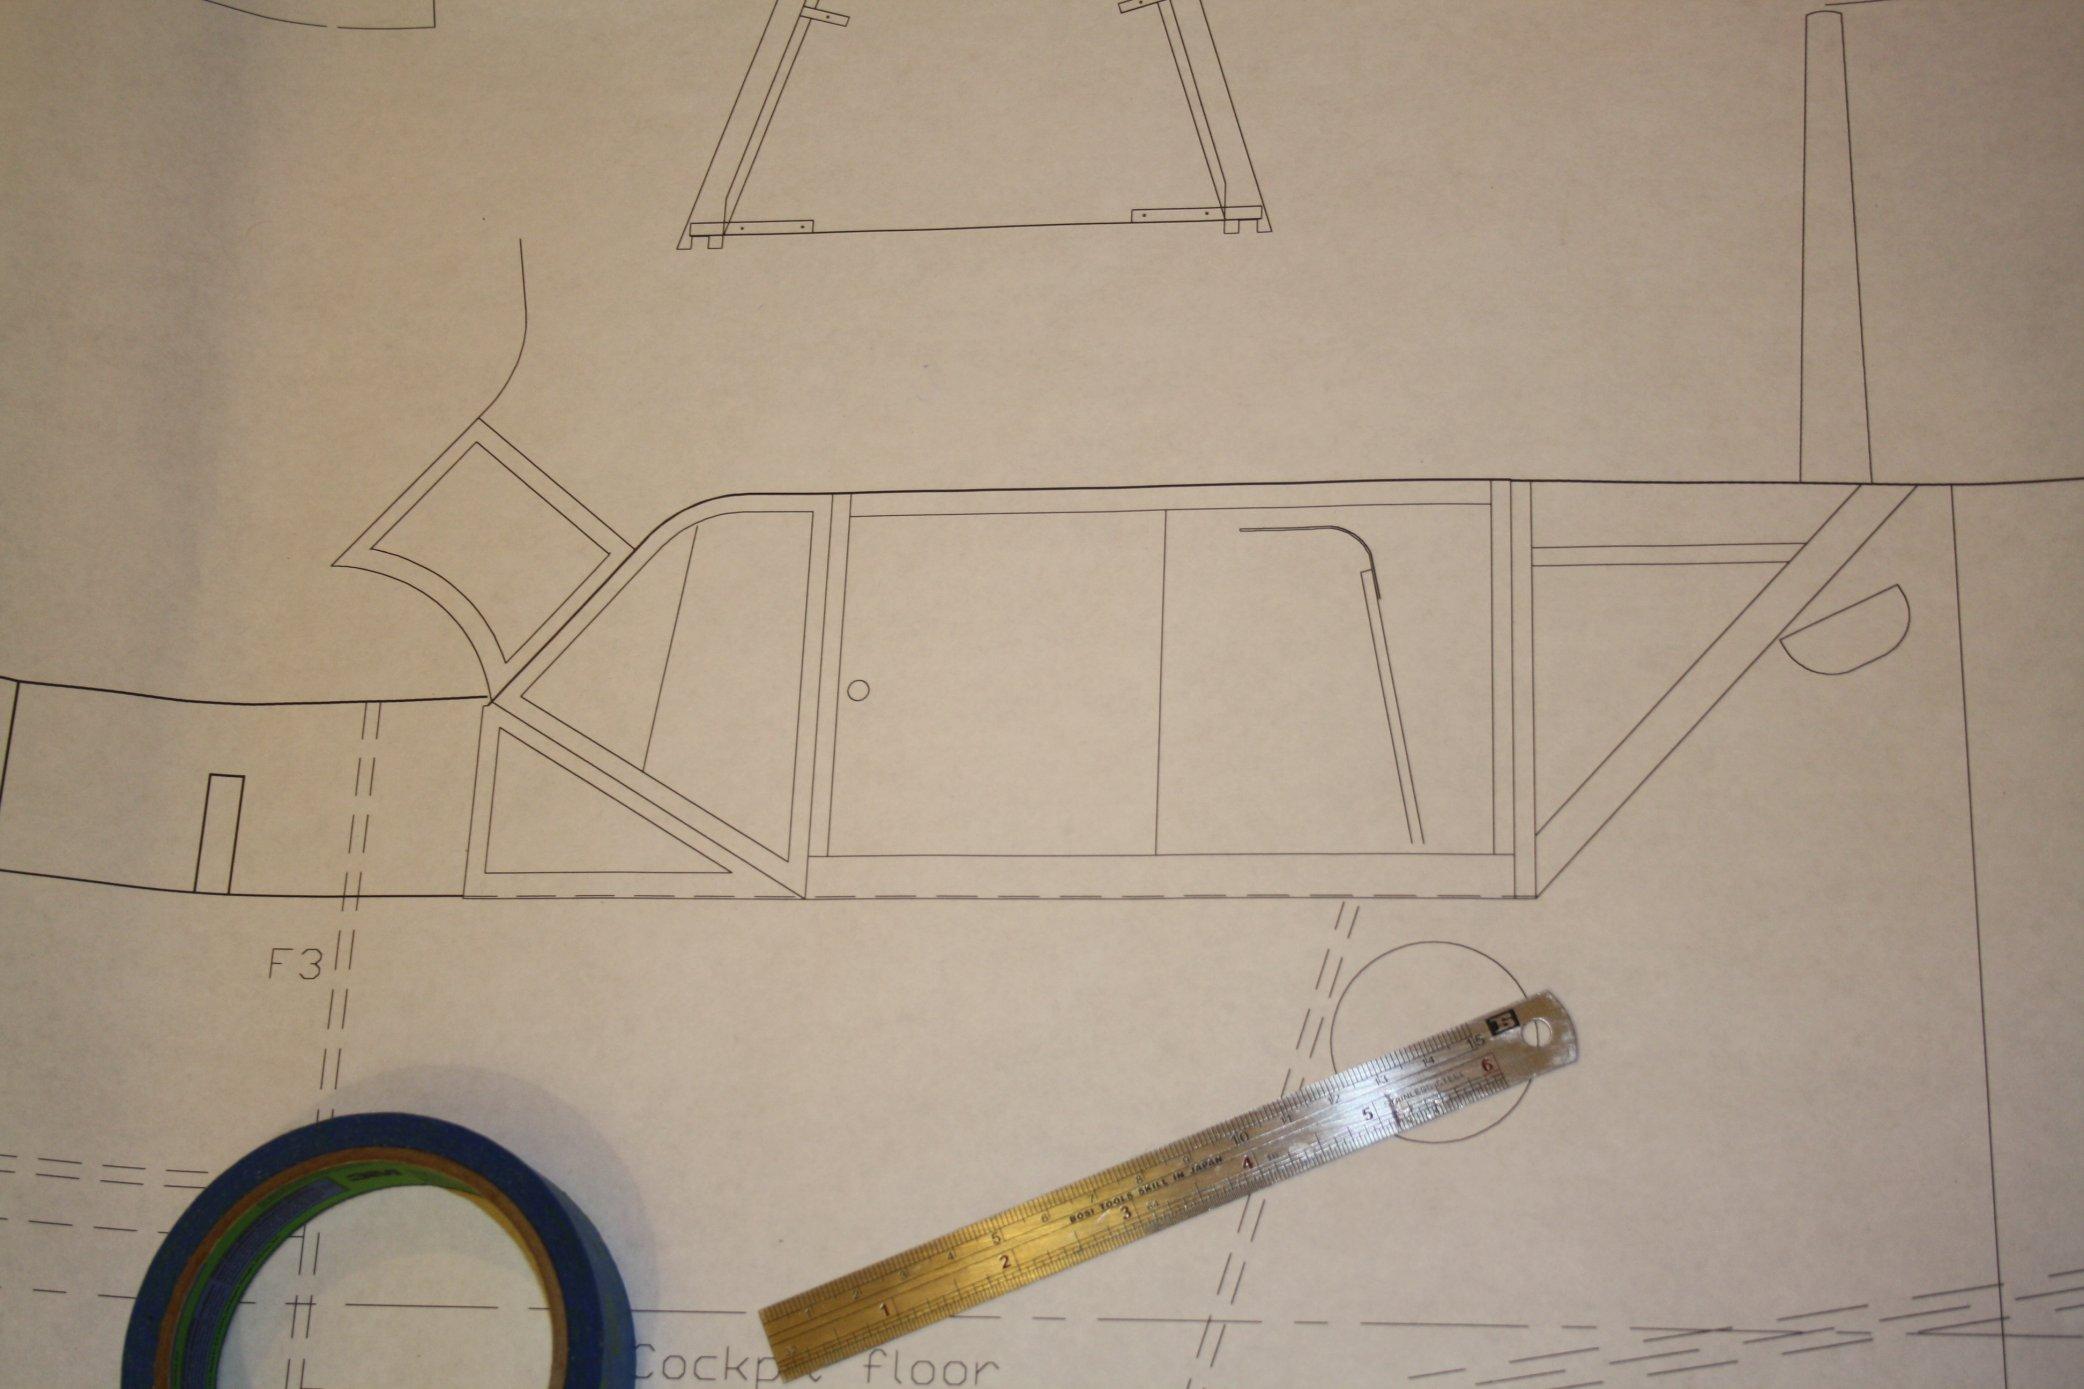 Click image for larger version  Name:2014_03_01 118 Masking the Cockpit.JPG Views:50 Size:251.9 KB ID:1973651